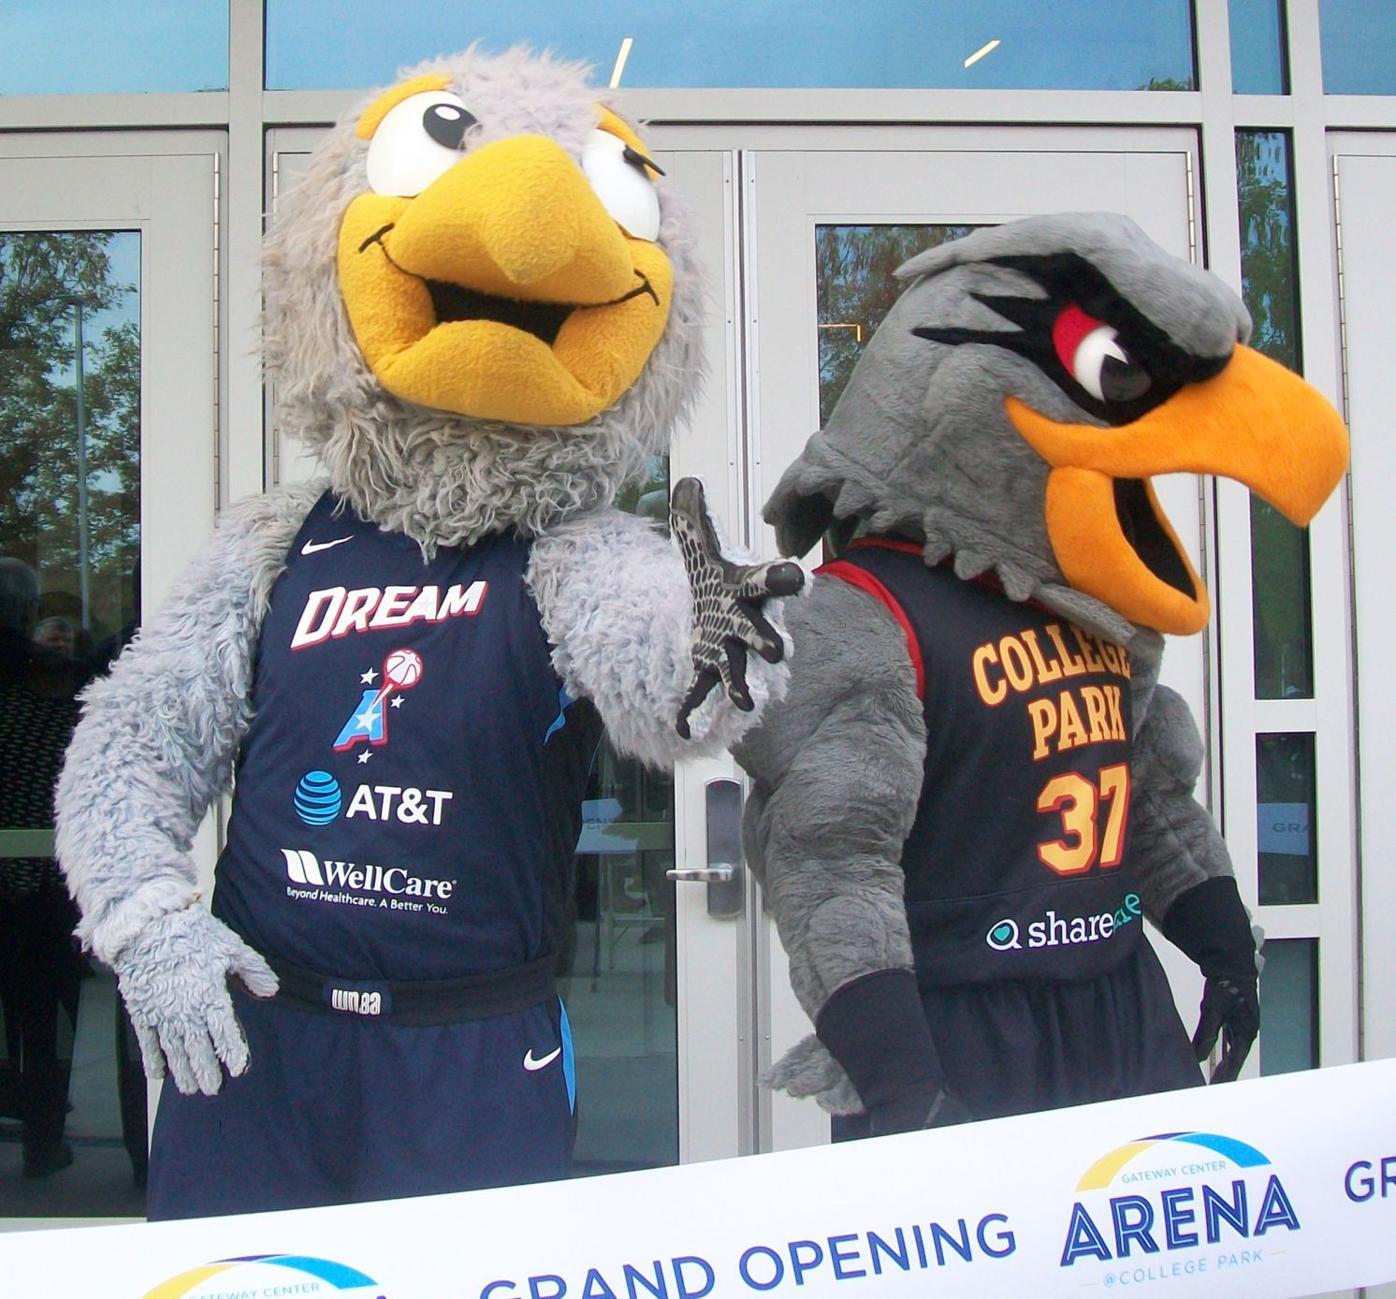 112019_SFN_Gateway_opens_008 mascots Star Colli Hawk